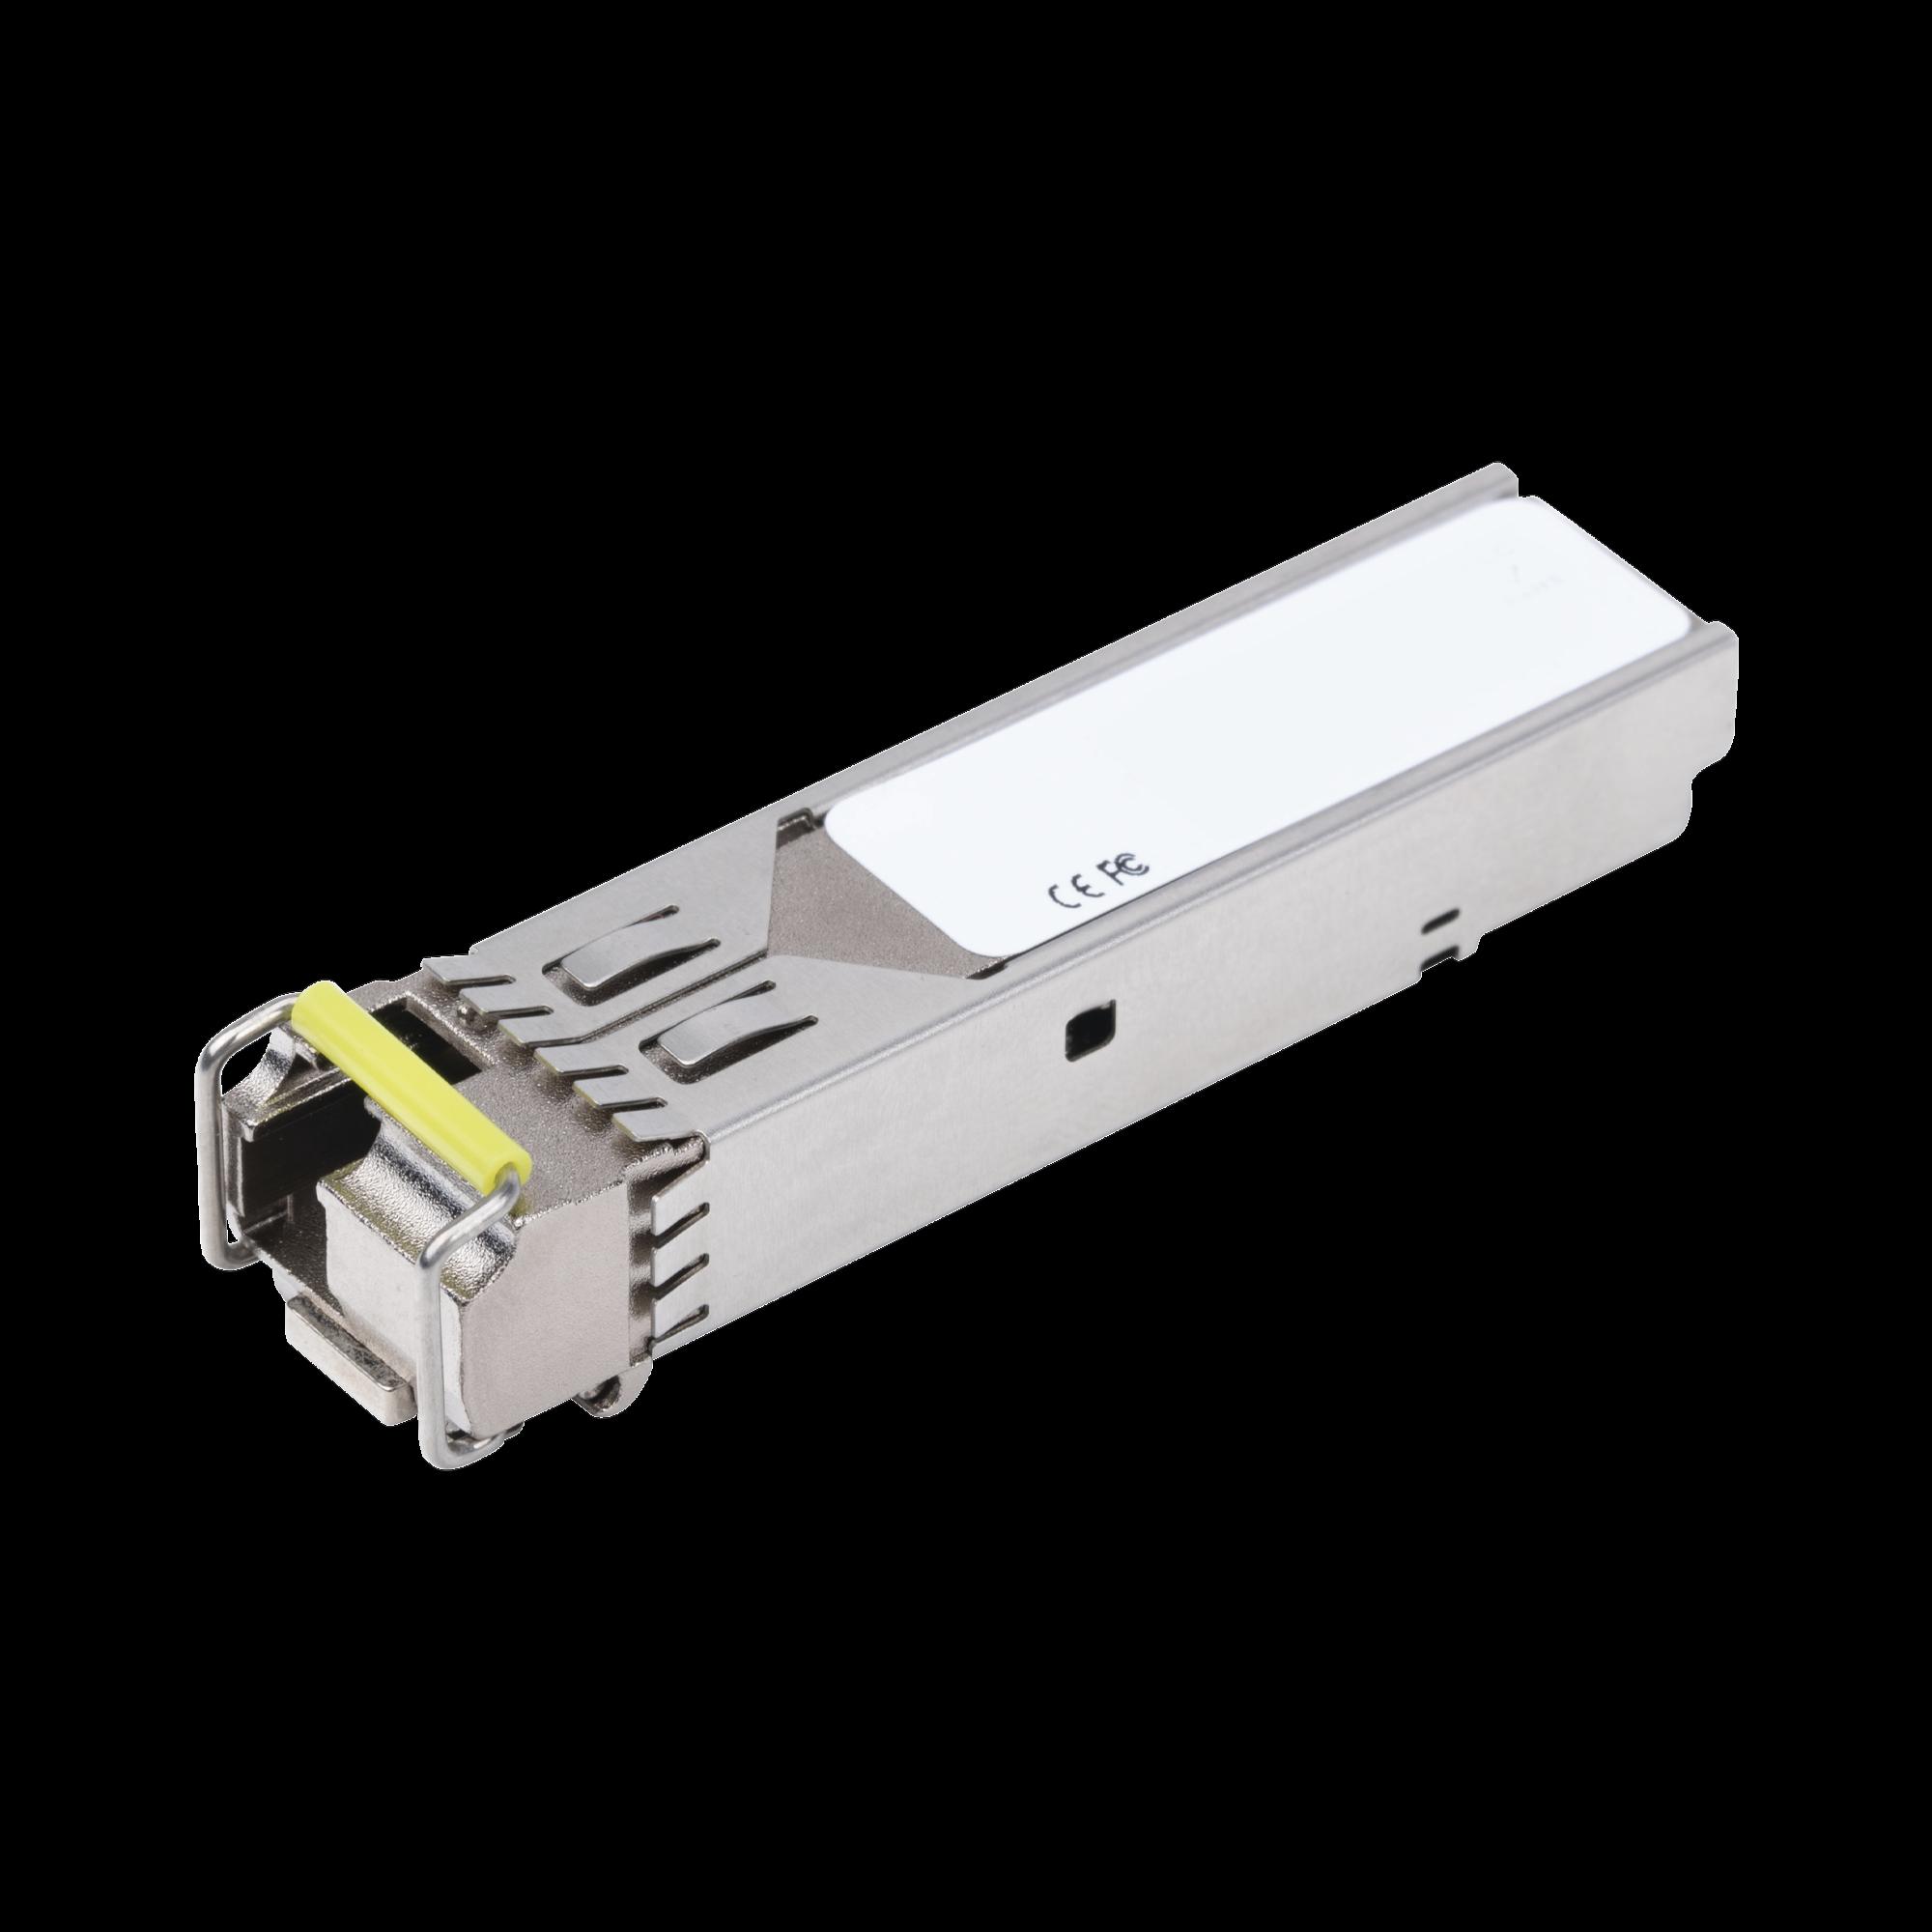 Tranceptor mini-Gbic SFP 1G LC TX:1550nm RX:1310 para fibra Mono Modo 20 Km WDM, Requiere MGB-LA20